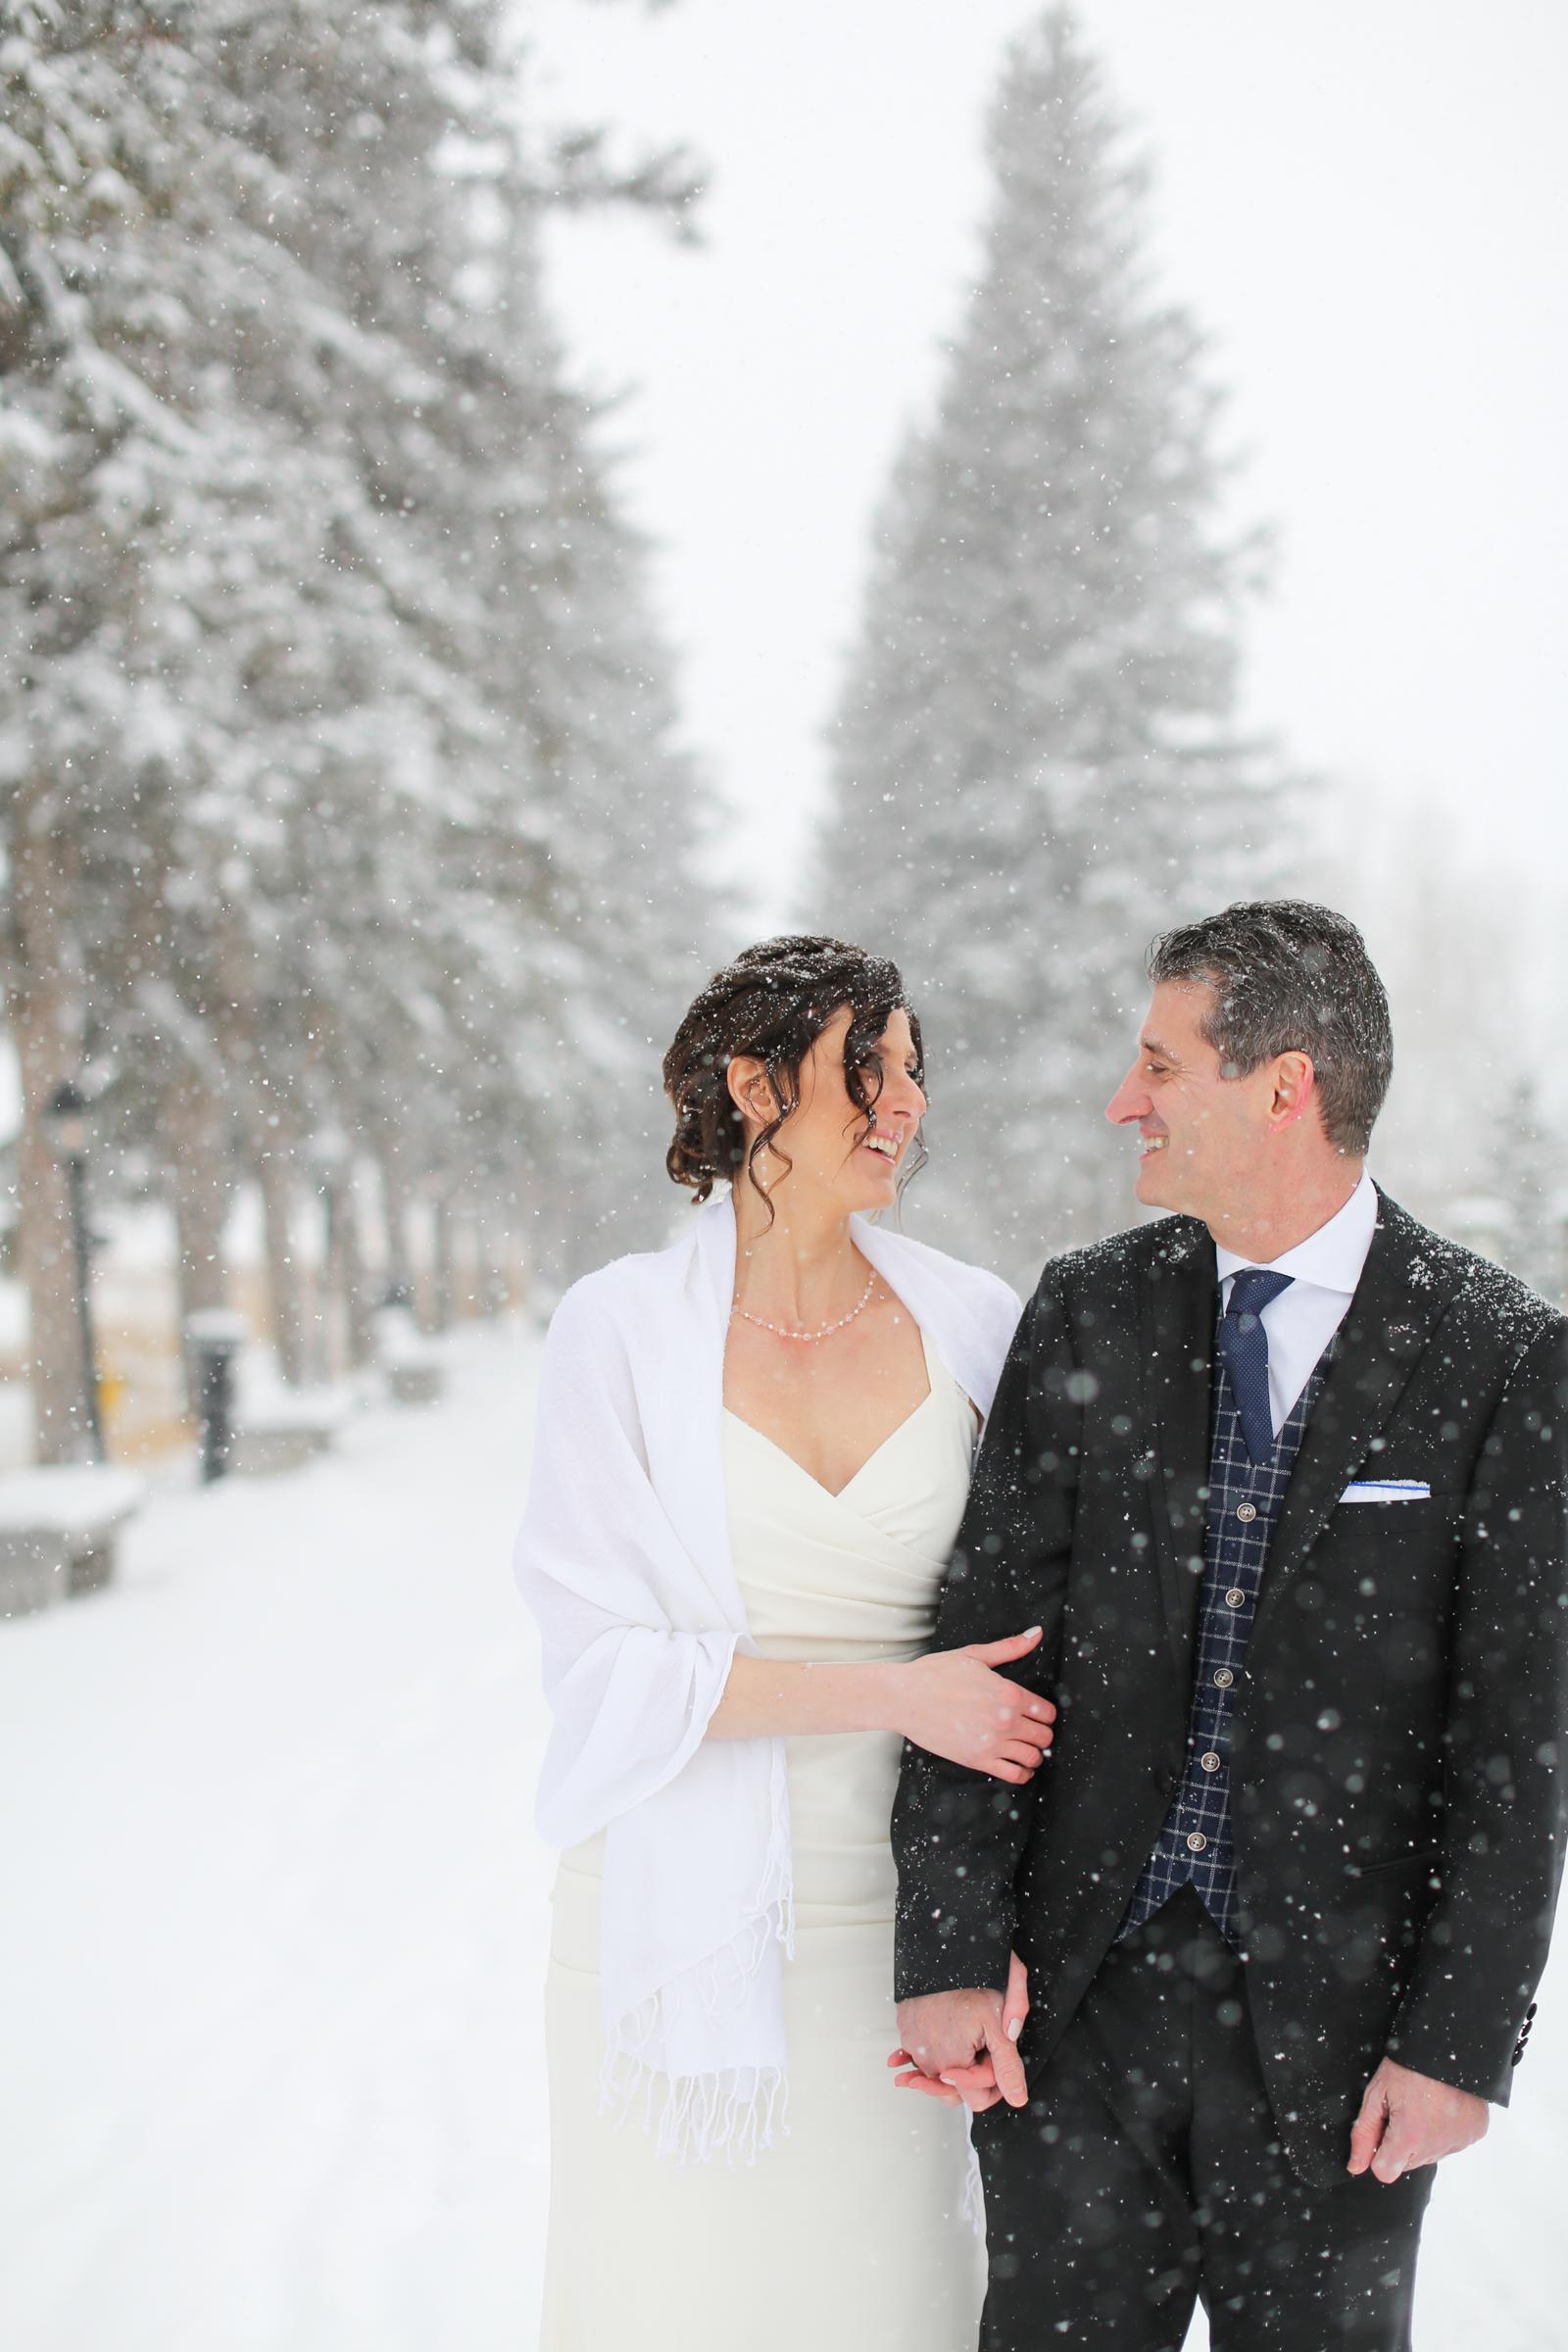 Melanie+Vince-Wedding-40.jpg